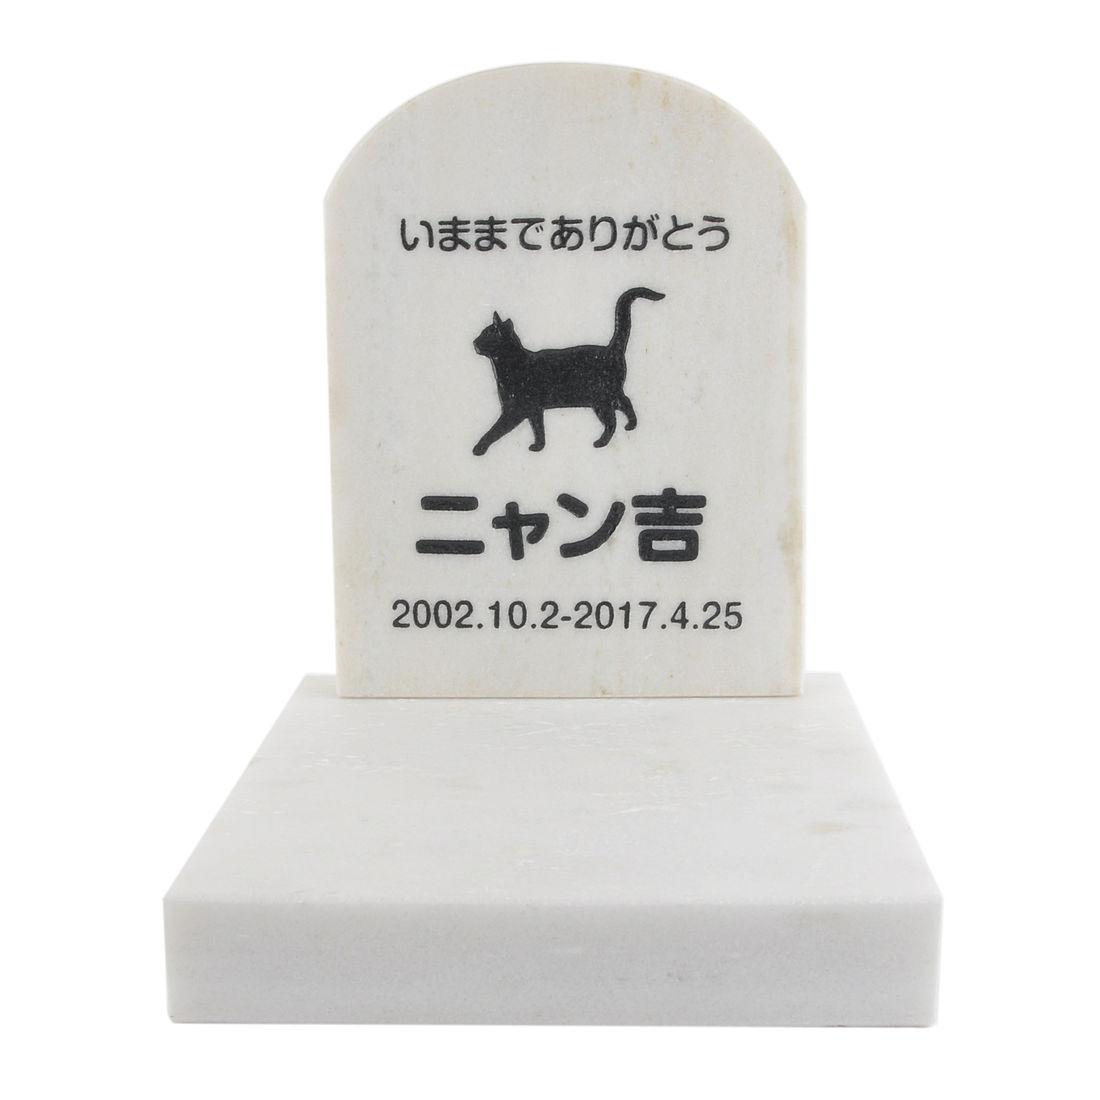 Pet&Love. ペットのお墓 天然石製 セット型 底板が厚く重いタイプ 御影石 ホワイト スタンダード  【HLS_DU】【楽ギフ_名入れ】 attr177attr ctgr2ctgr sml3sml+ctgr2ctgr CAT